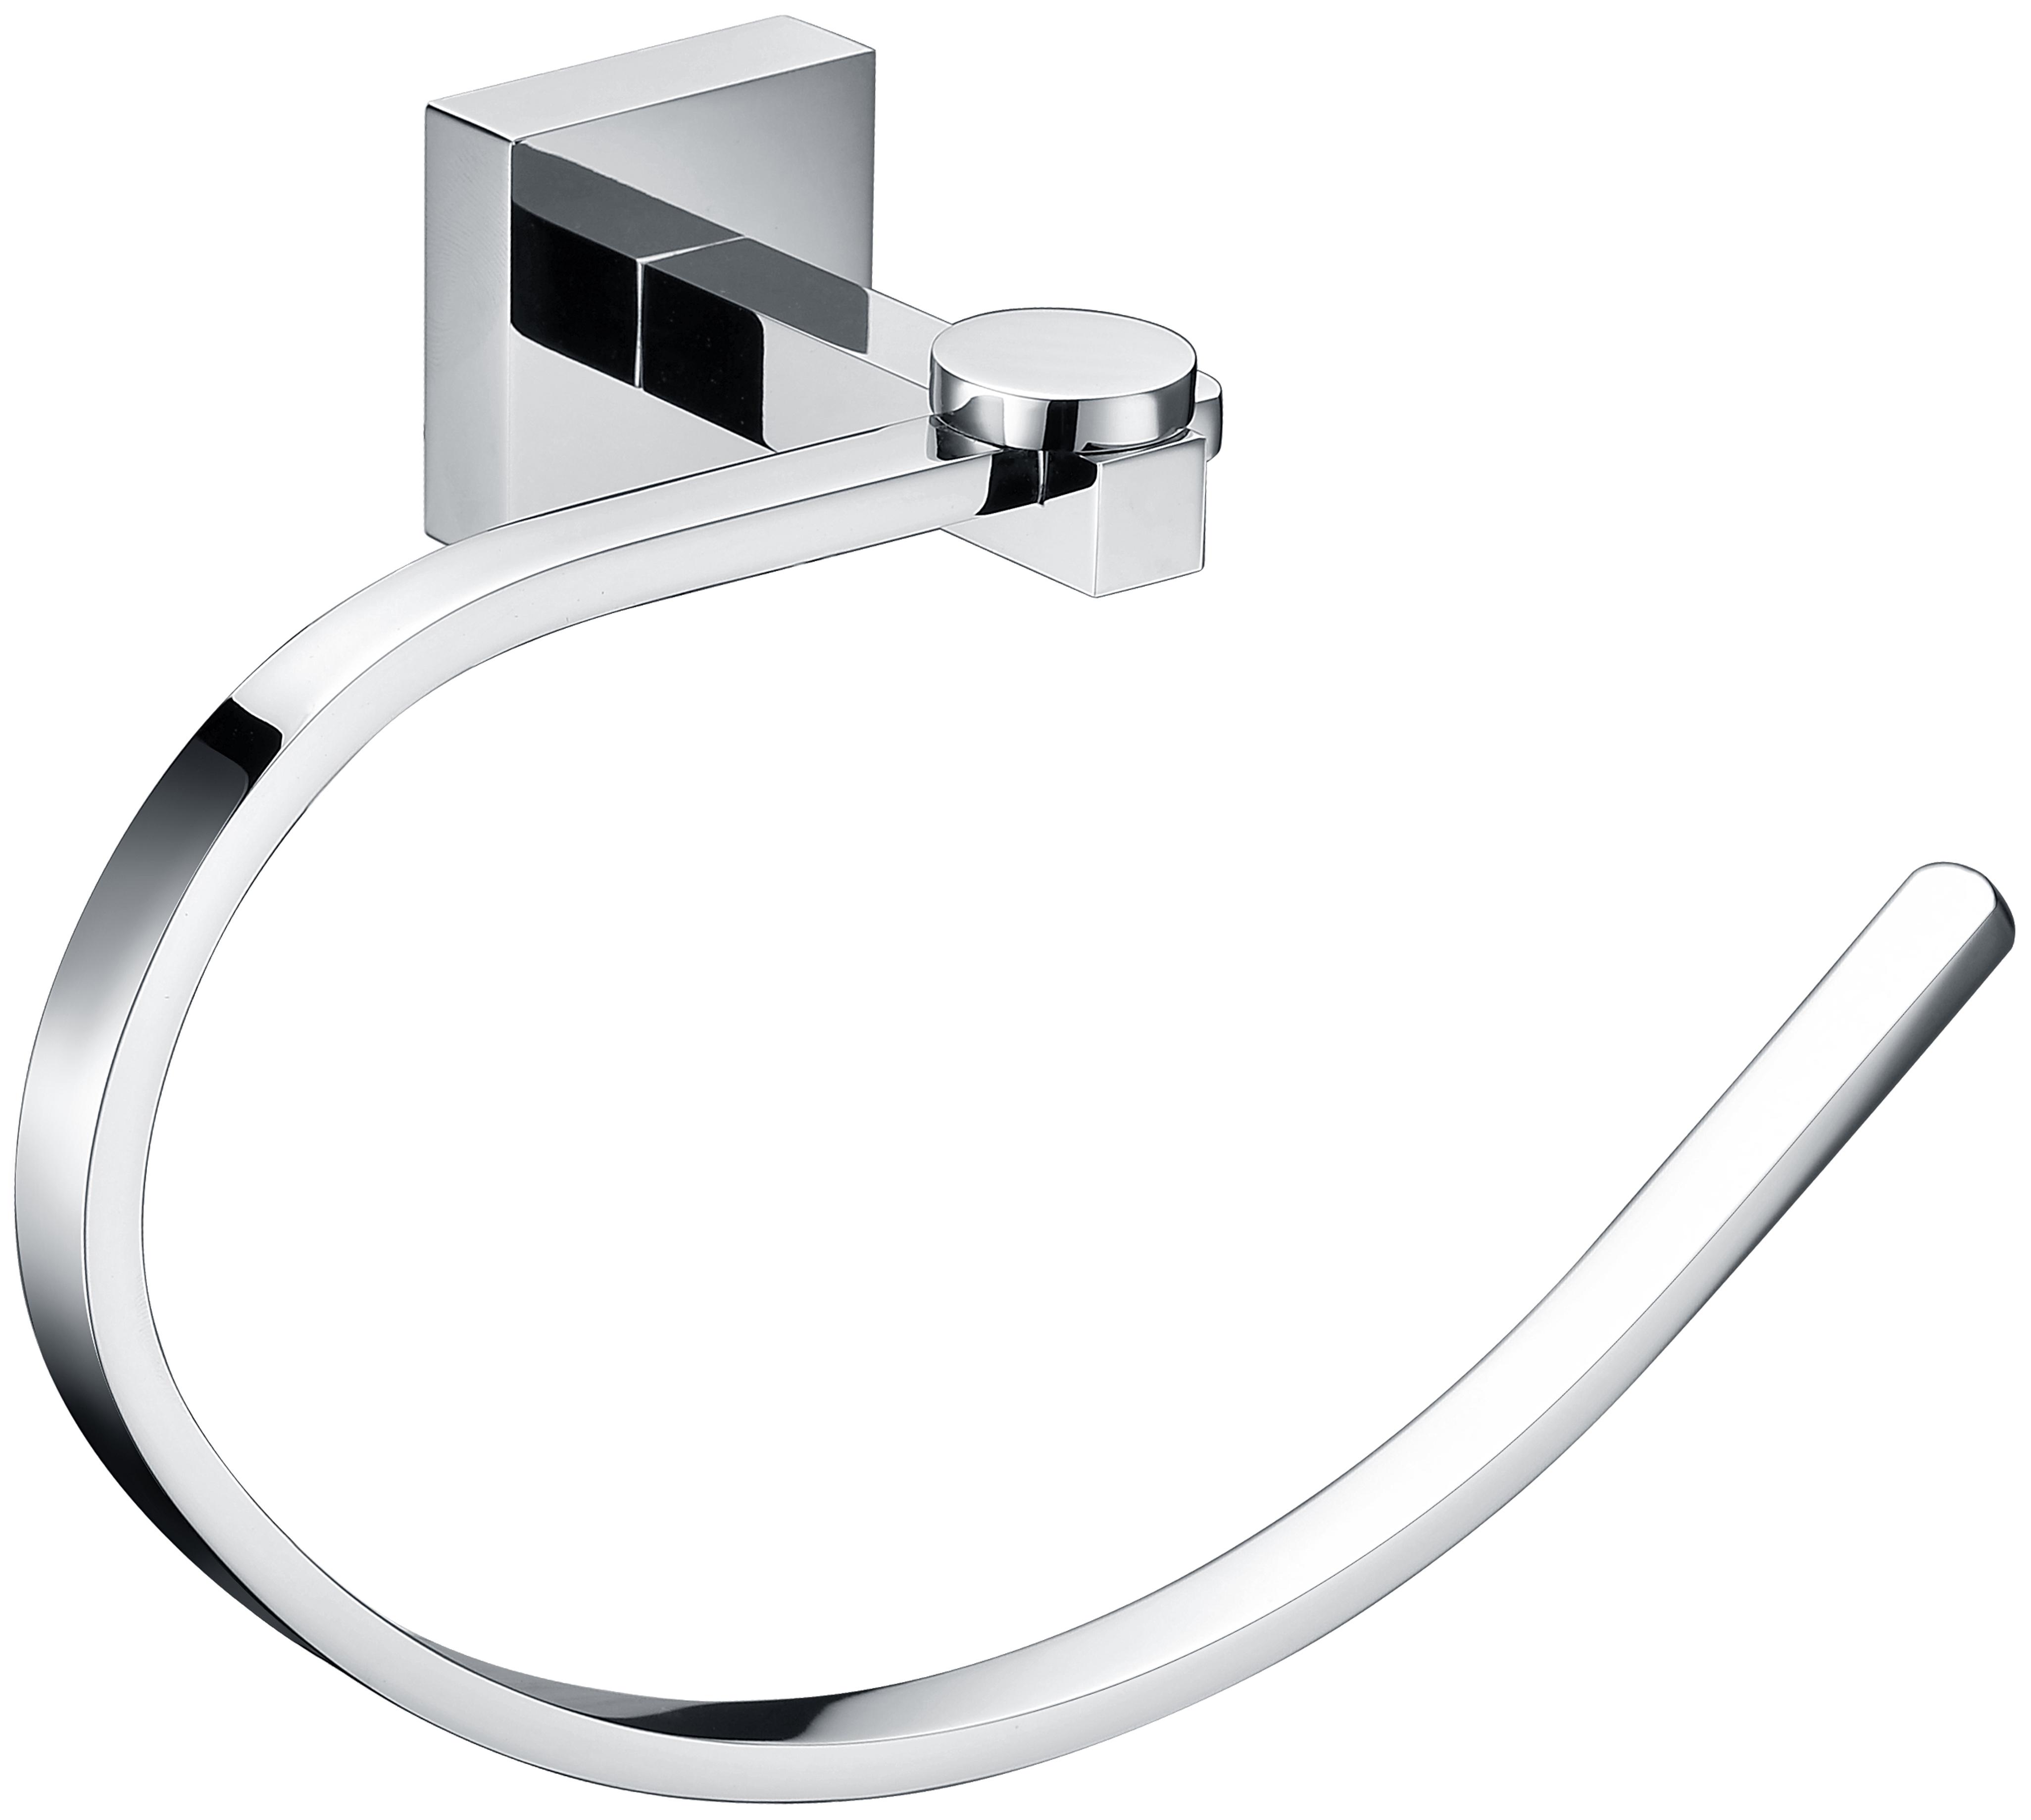 Buy Hot Item Bathroom Accessories Solid Brass Towel Ring